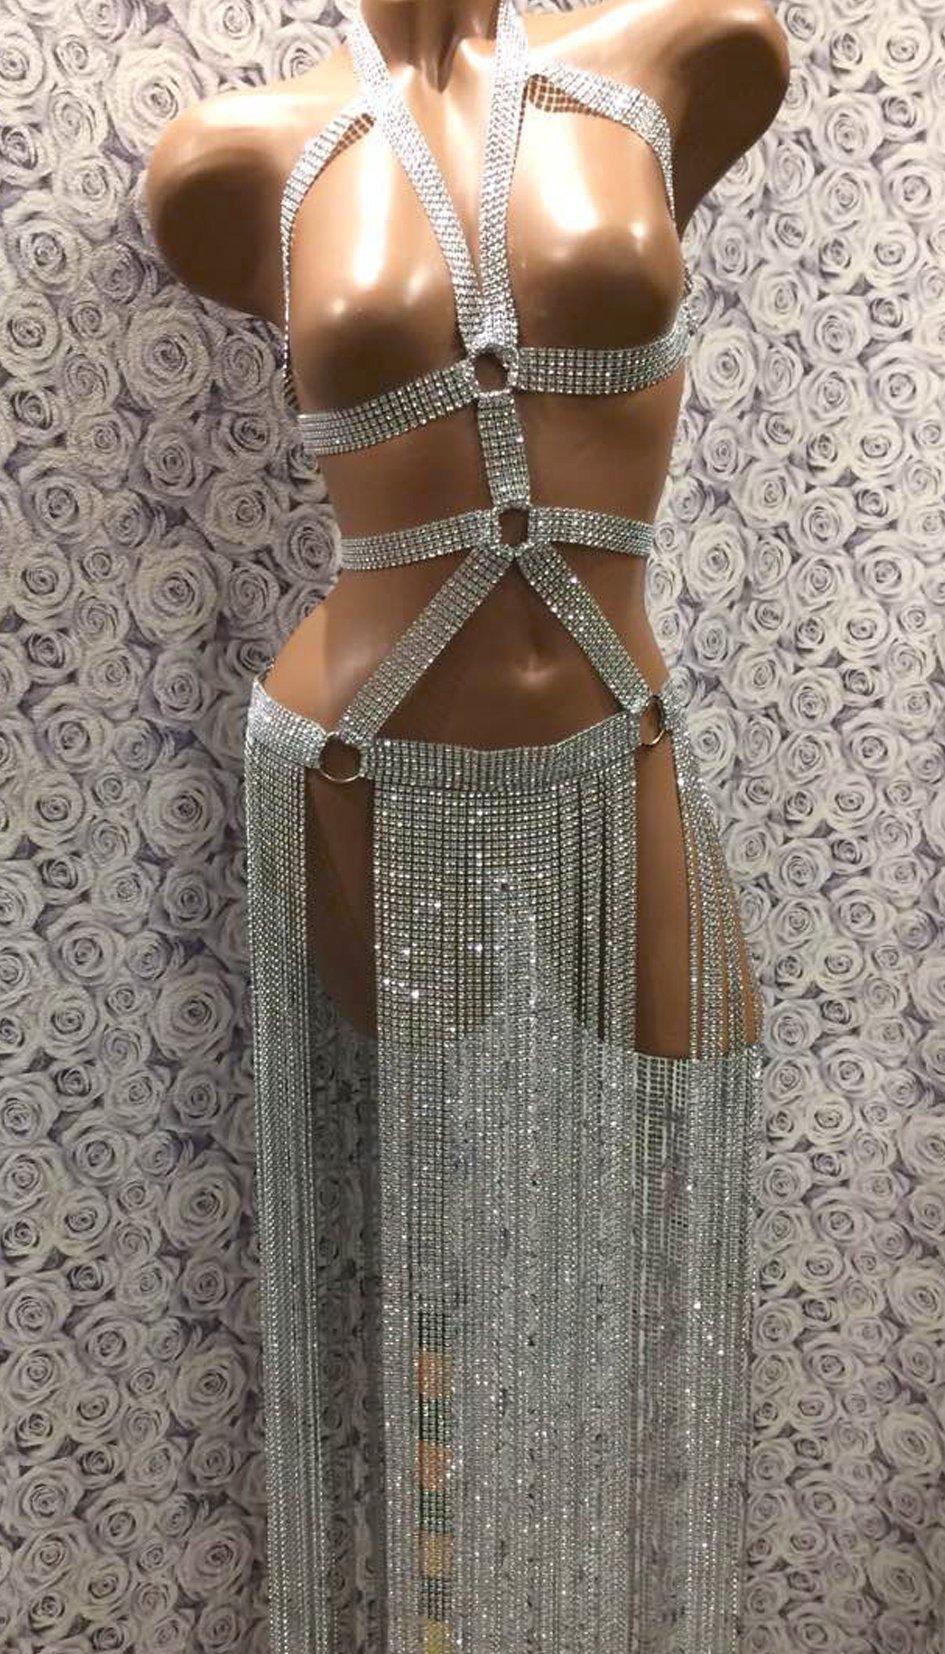 Rhinestones Skirt, Rave Skirt, Sexy Dancewear, Rave Clothing, Festival Clothing, Sexy Wear, Sexy Dress, Exotic Dancewear, Sexy Lingerie, Dancewear, Party Dress, Fashion Skirt, Stripper Skirt,